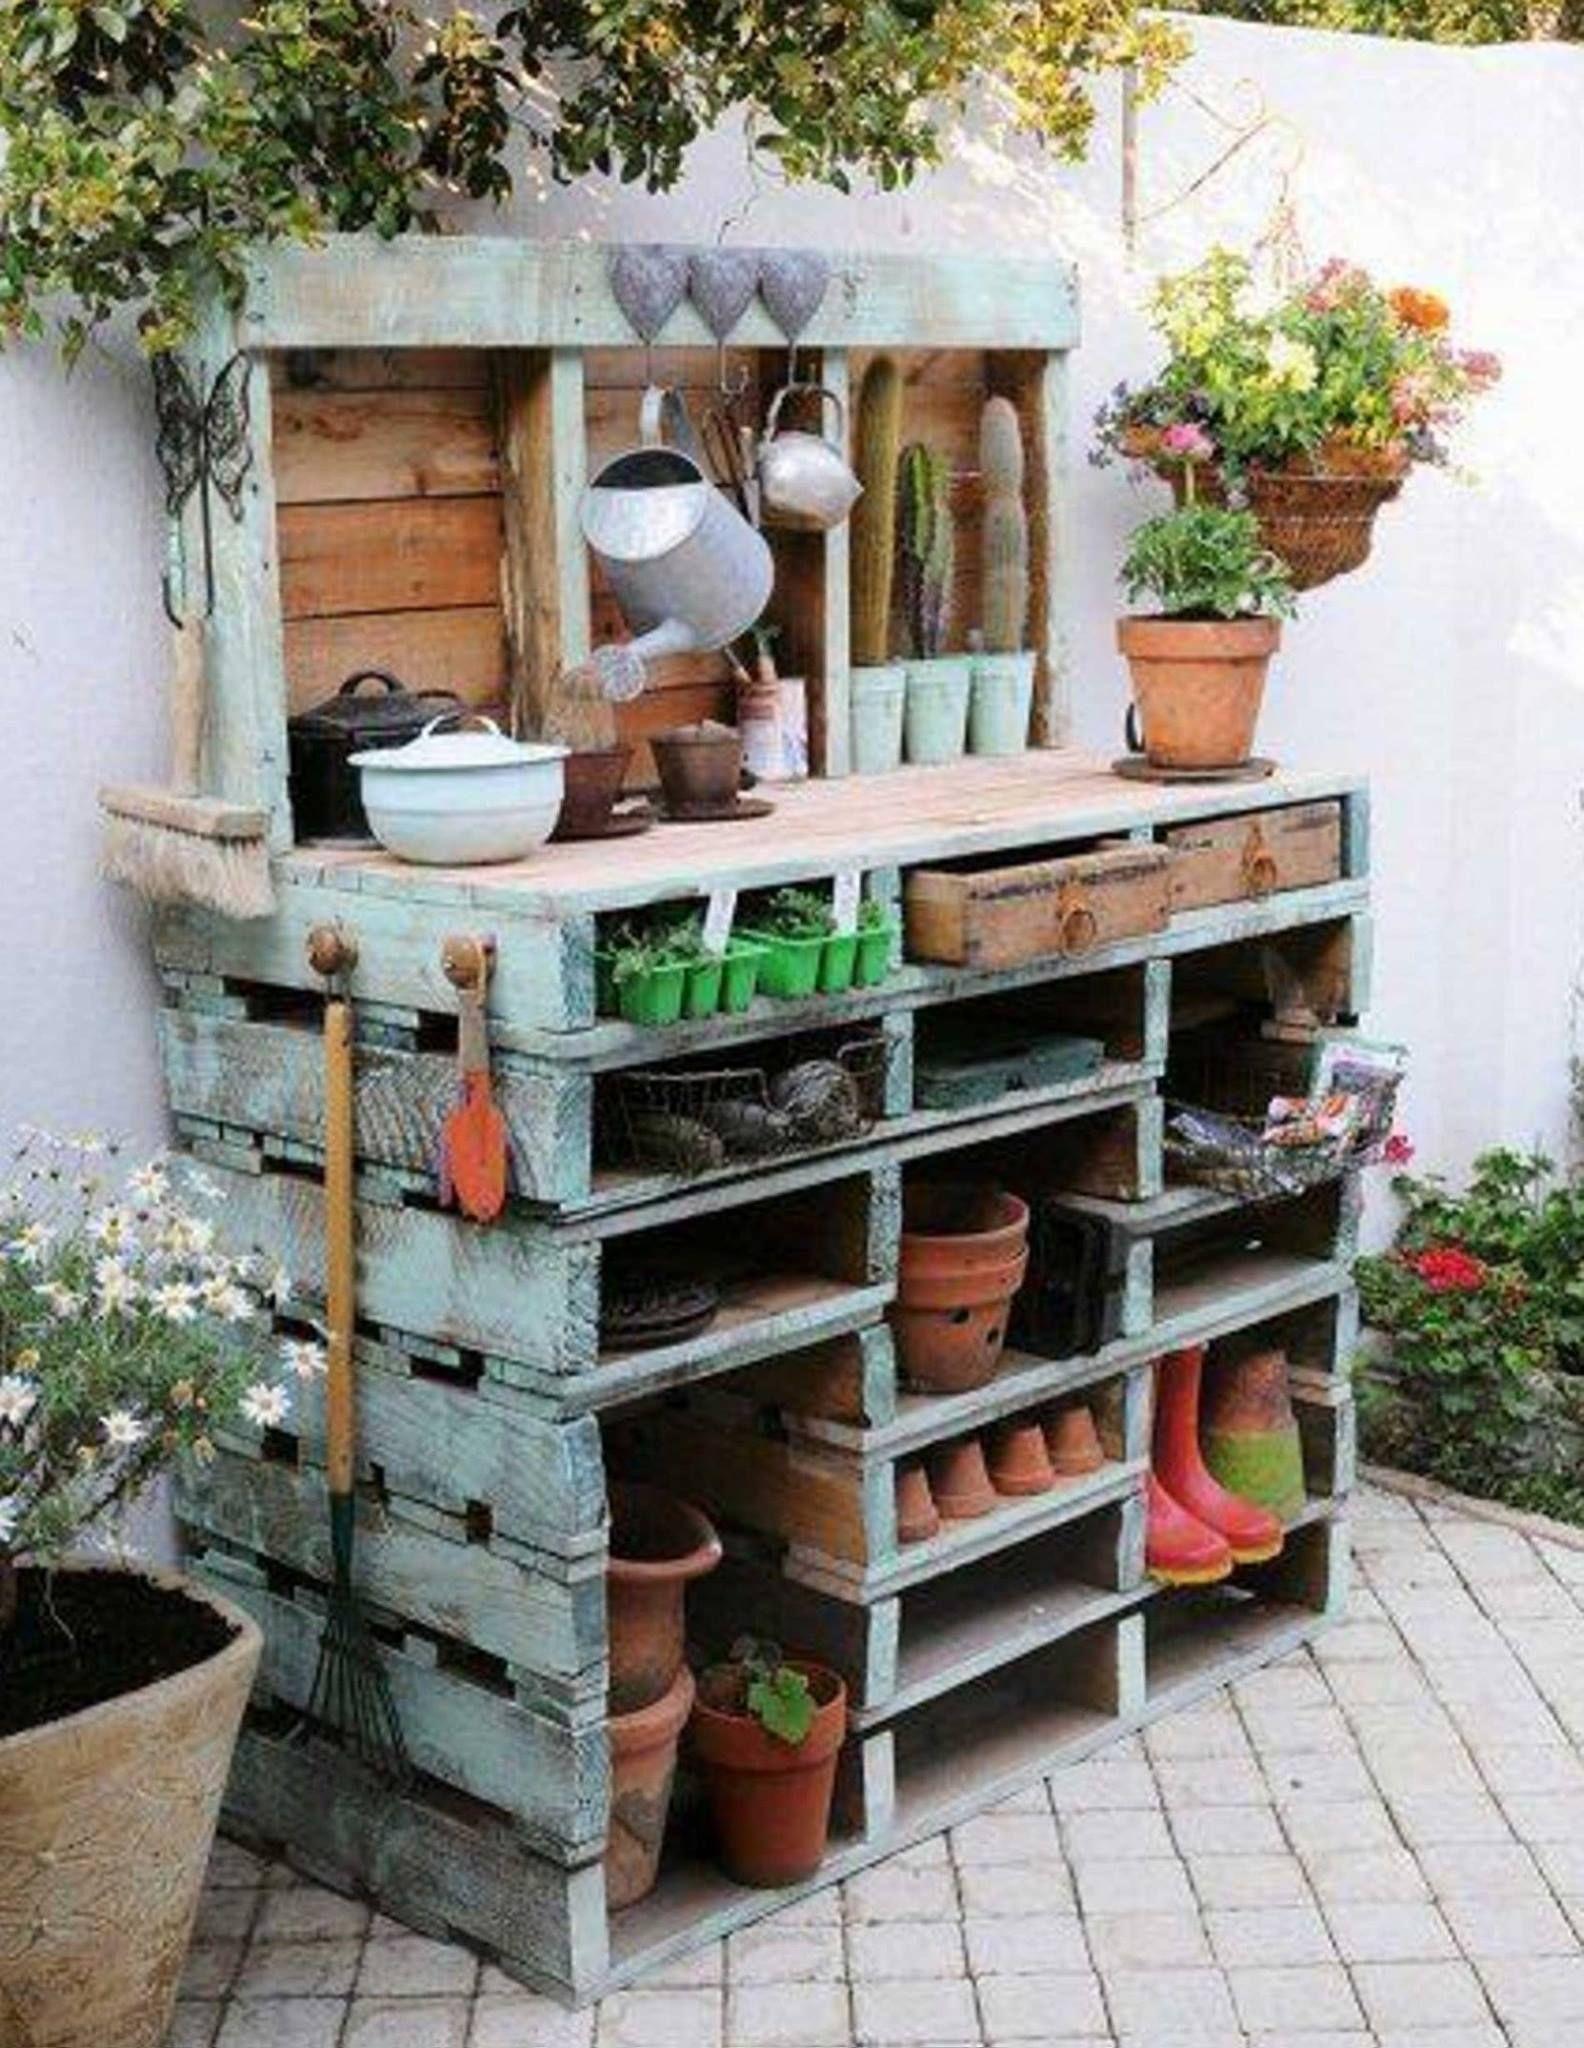 Pin De Letizia Bryan En Gardening And Yard Ideas Pinterest Deberes # Muebles Cadena Flores